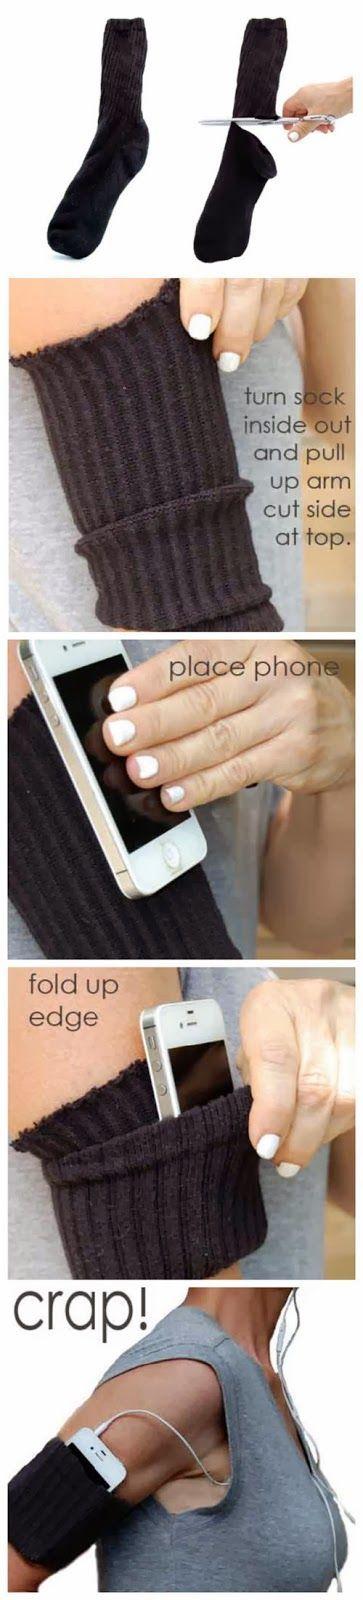 How To Make An iPhone Armband